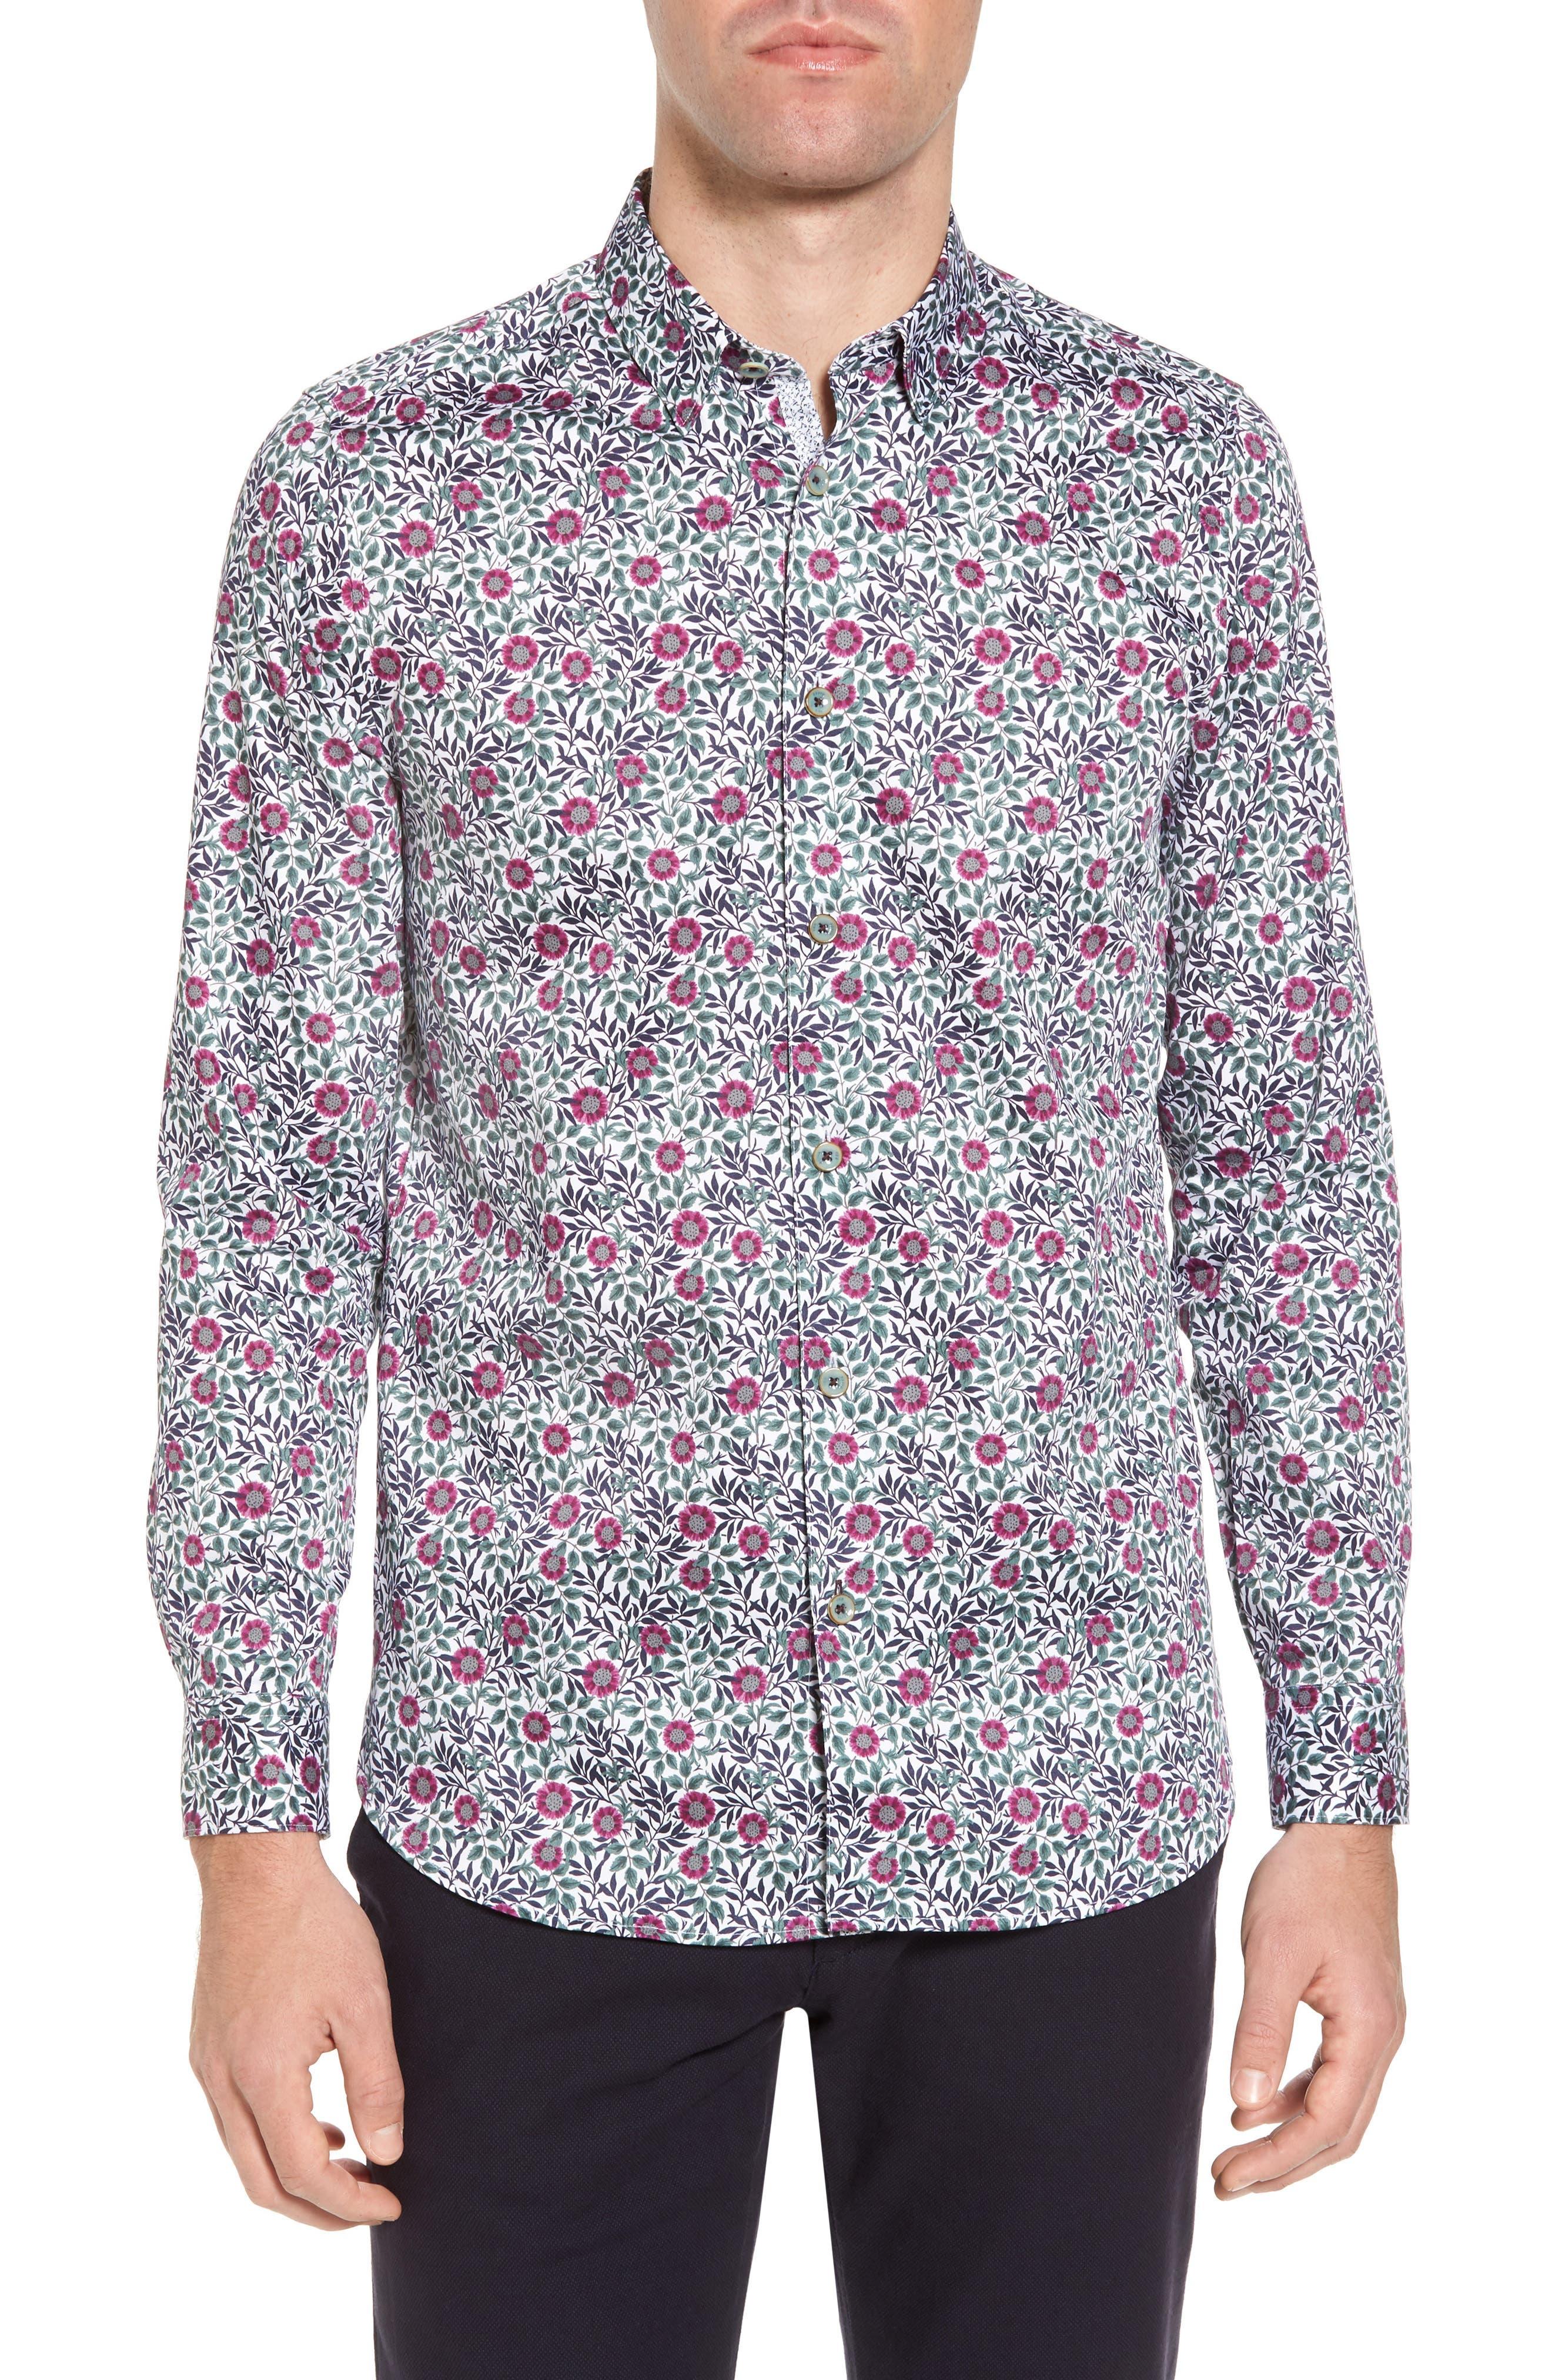 Orense Floral Print Slim Fit Shirt,                             Main thumbnail 1, color,                             Green